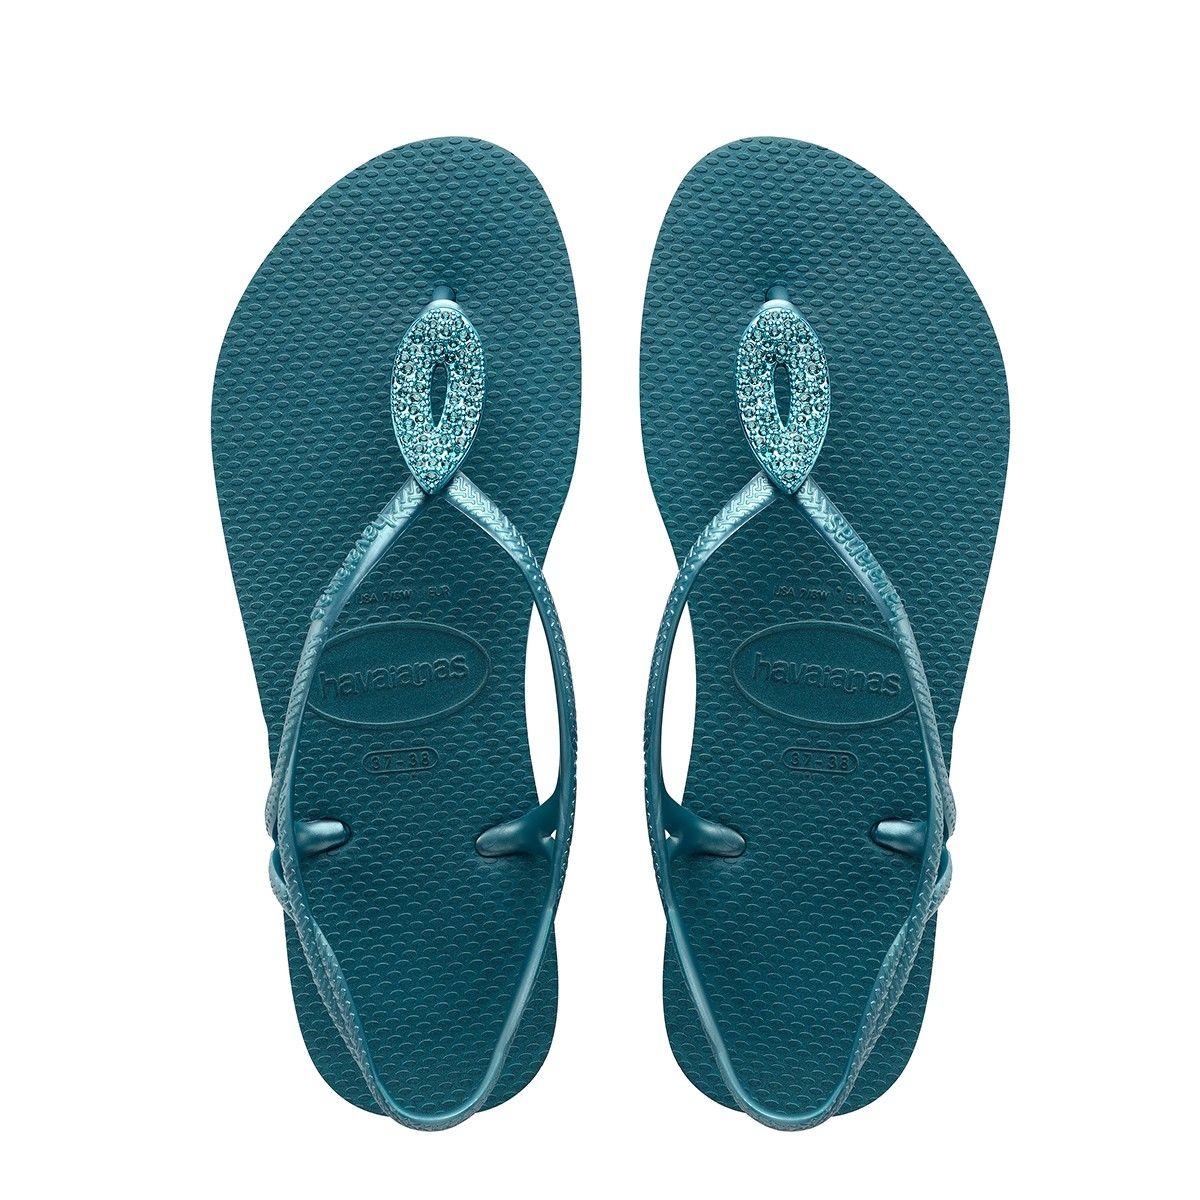 06705a62b HAVAIANAS LUNA SPECIAL SANDAL PETROLEUM.  havaianas  shoes  all ...